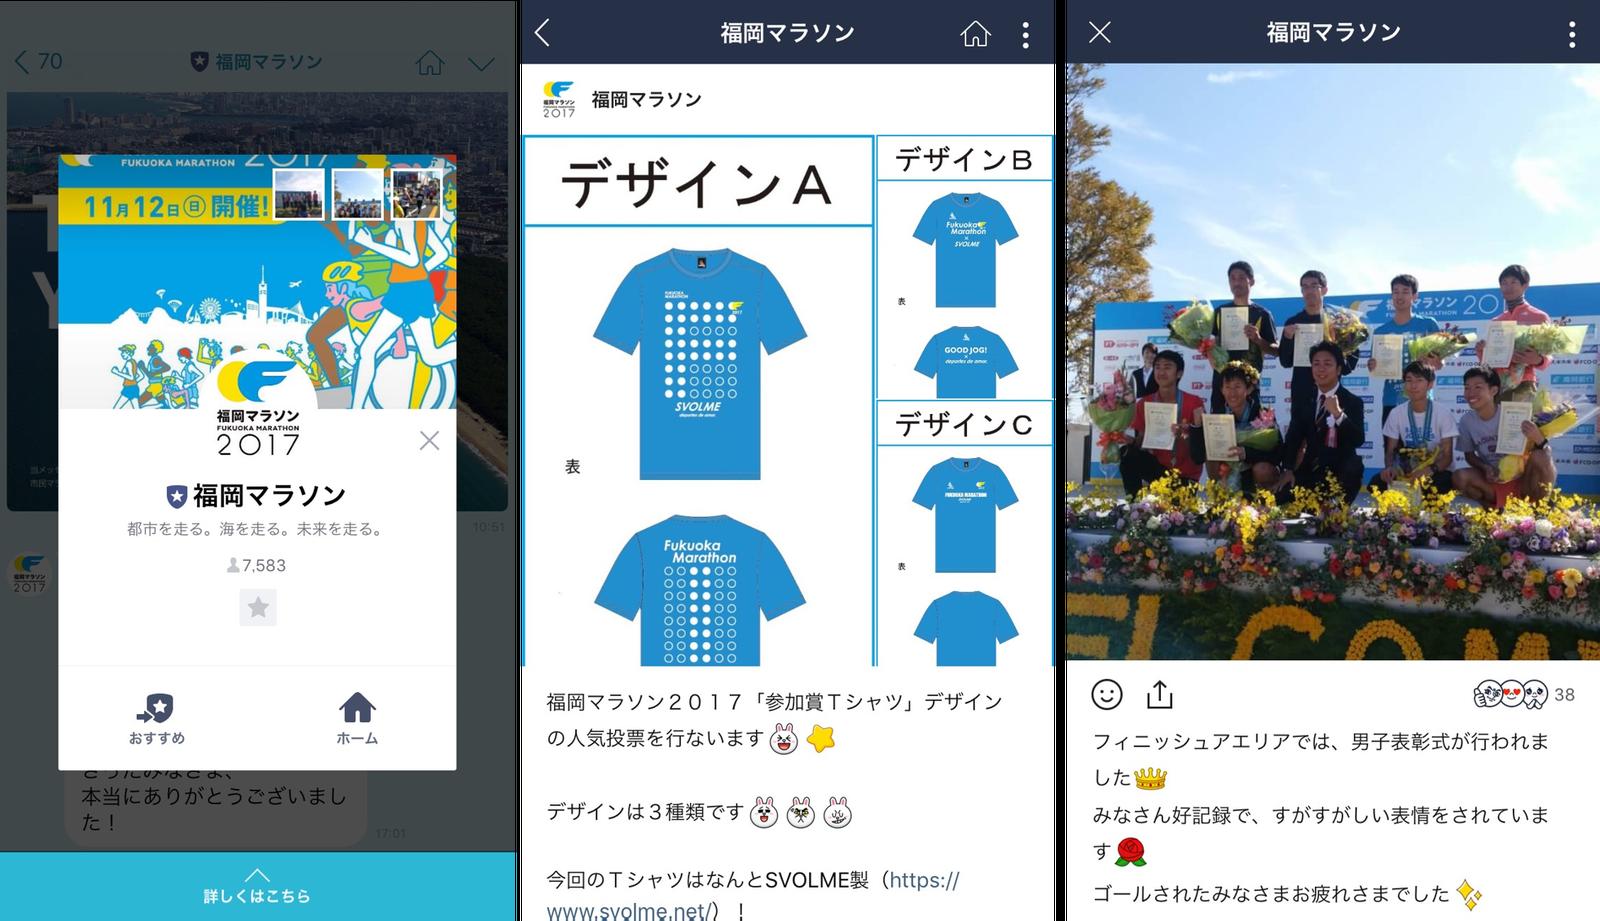 LINE  福岡マラソンLINE@